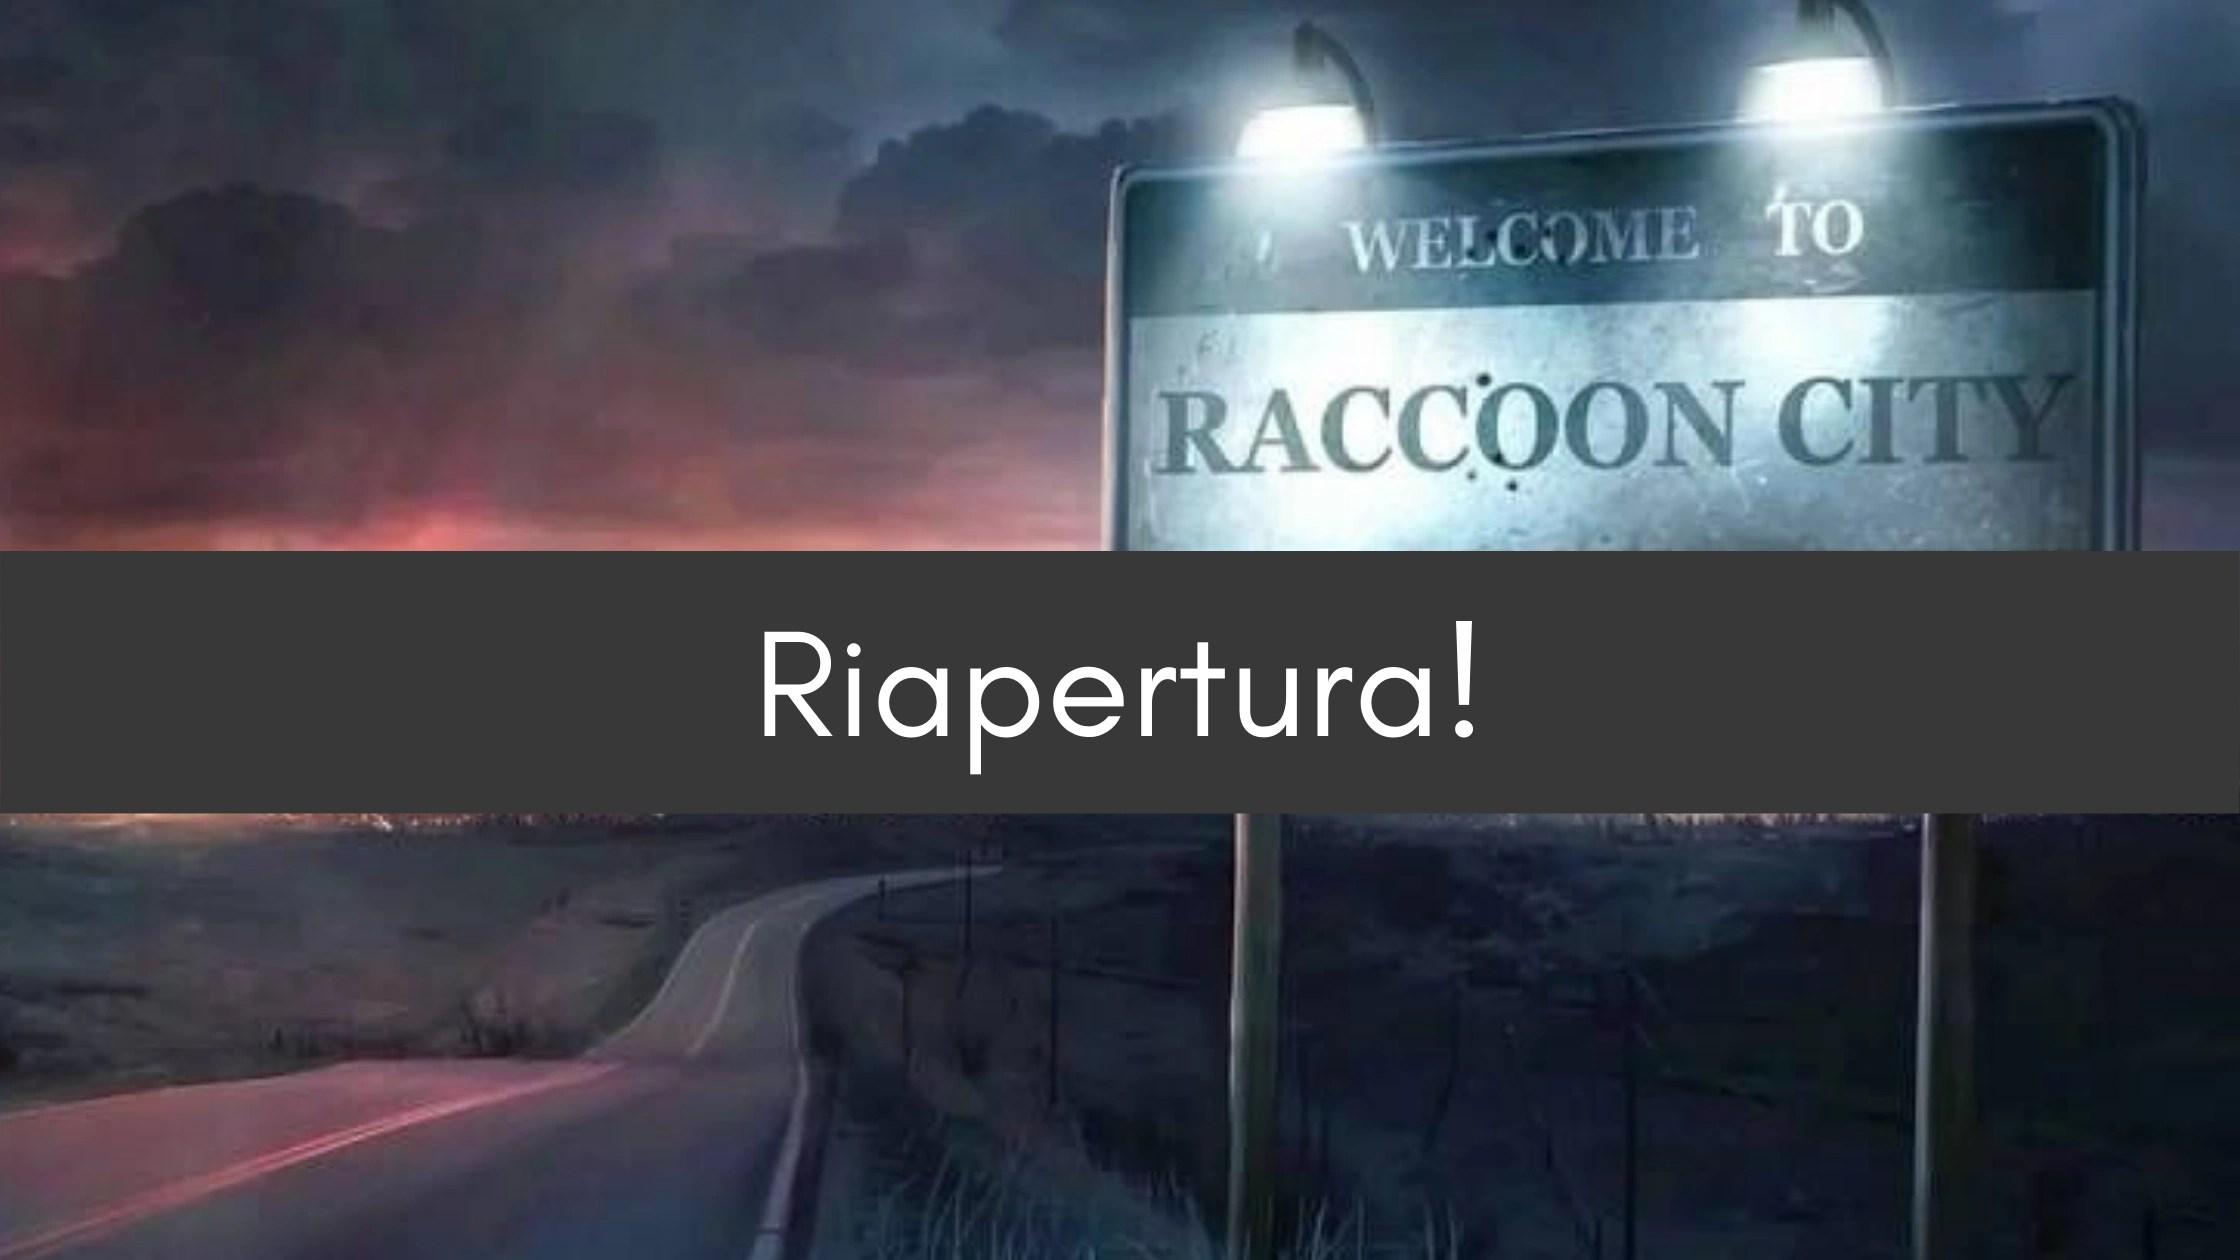 Cronache Da Raccoon City – Riapertura!